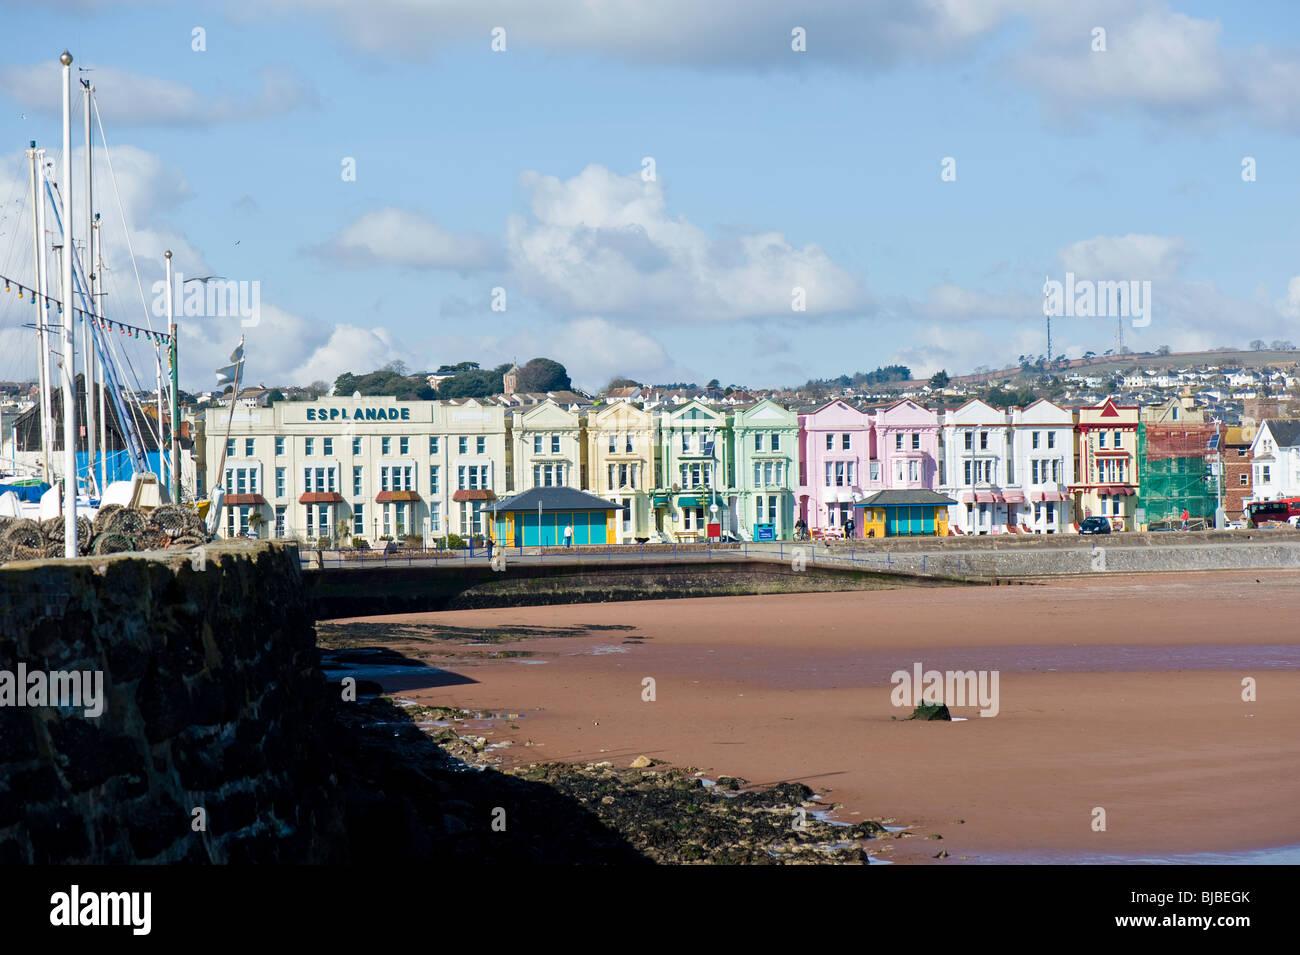 Paignton, Devon, United Kingdom Stock Photo: 28527091 - Alamy